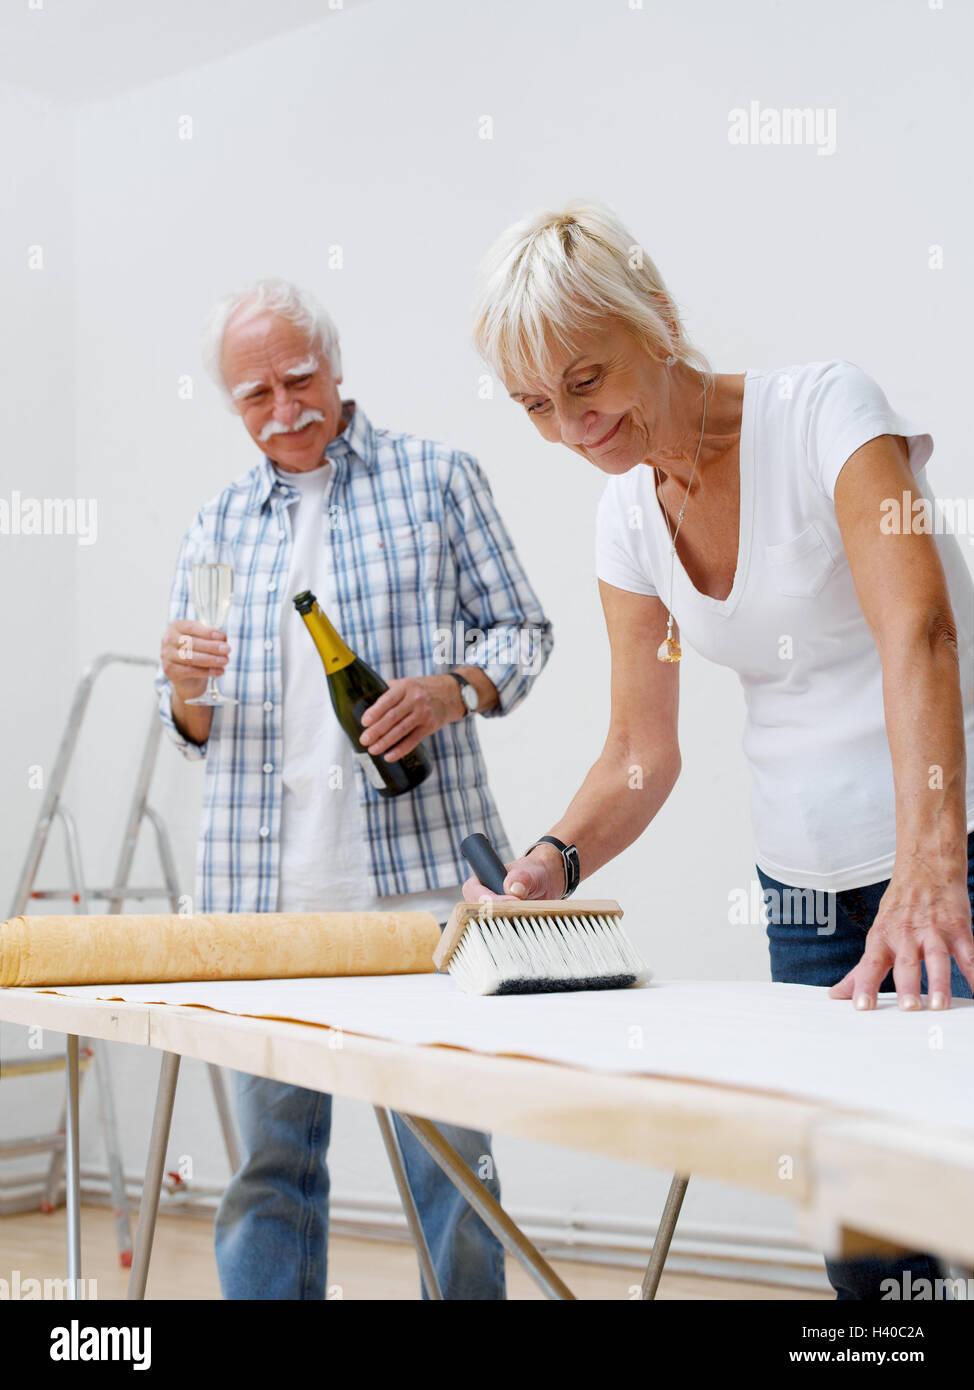 Flat Renovation Works Senior Couple Wallpaper 60 70 Years Stock